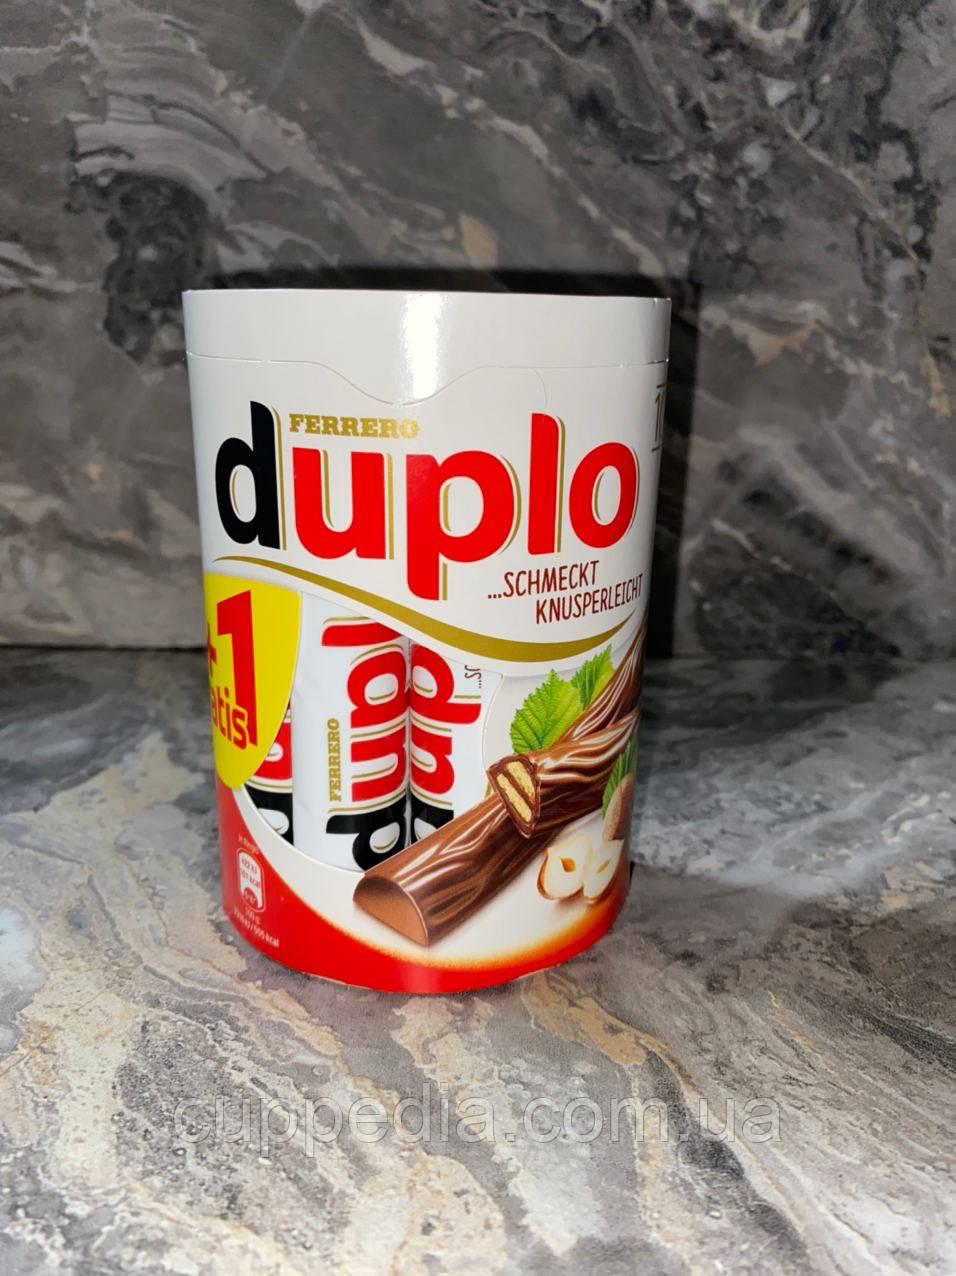 Батончики Duplo Ferrero 182 грм